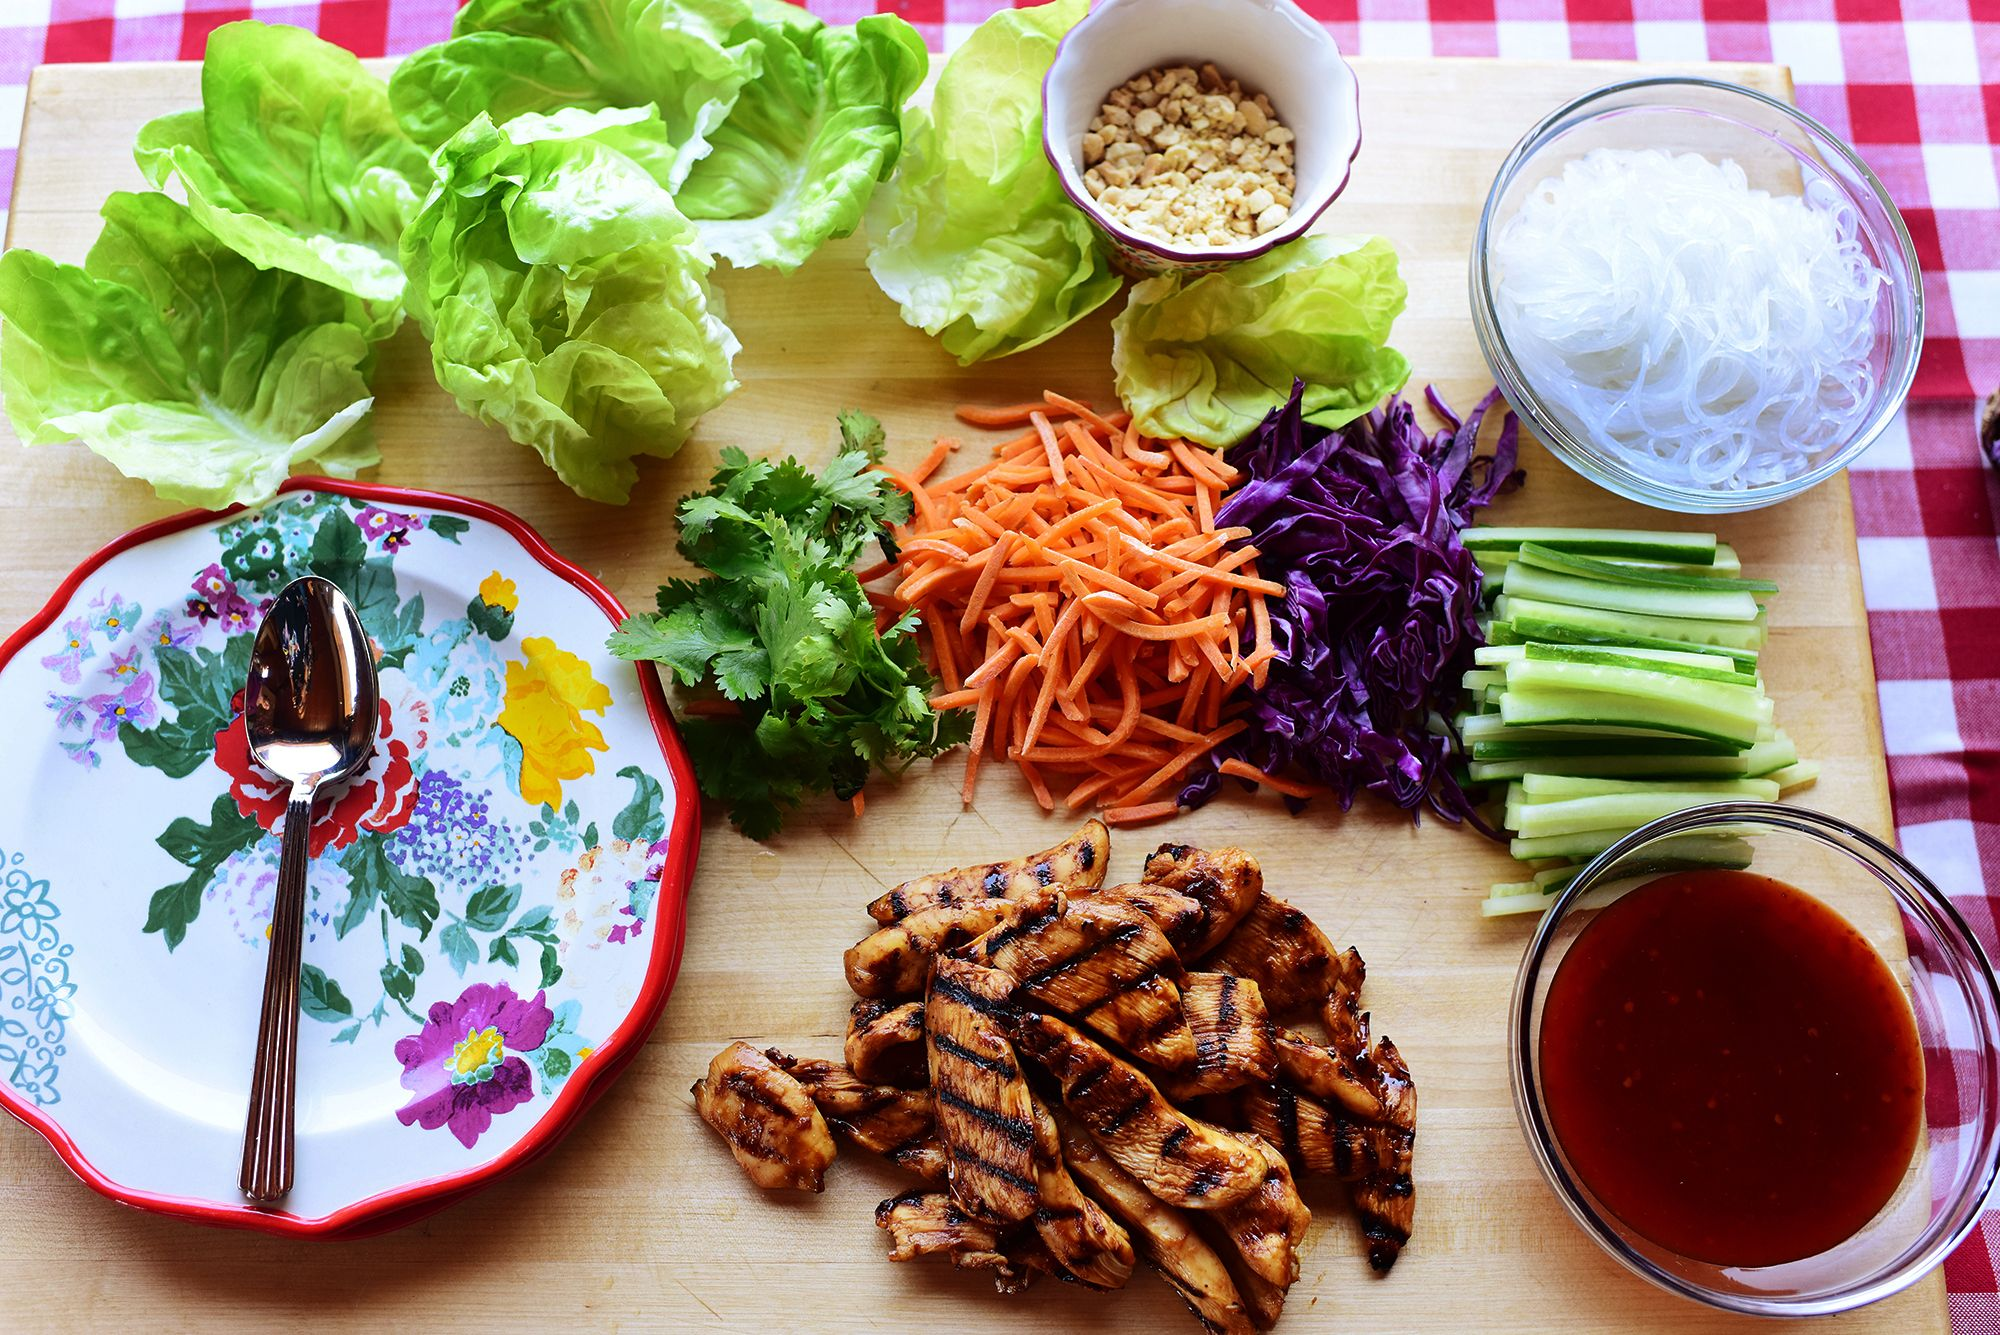 Lettuce Wraps Recipe Food recipes, Lettuce wraps